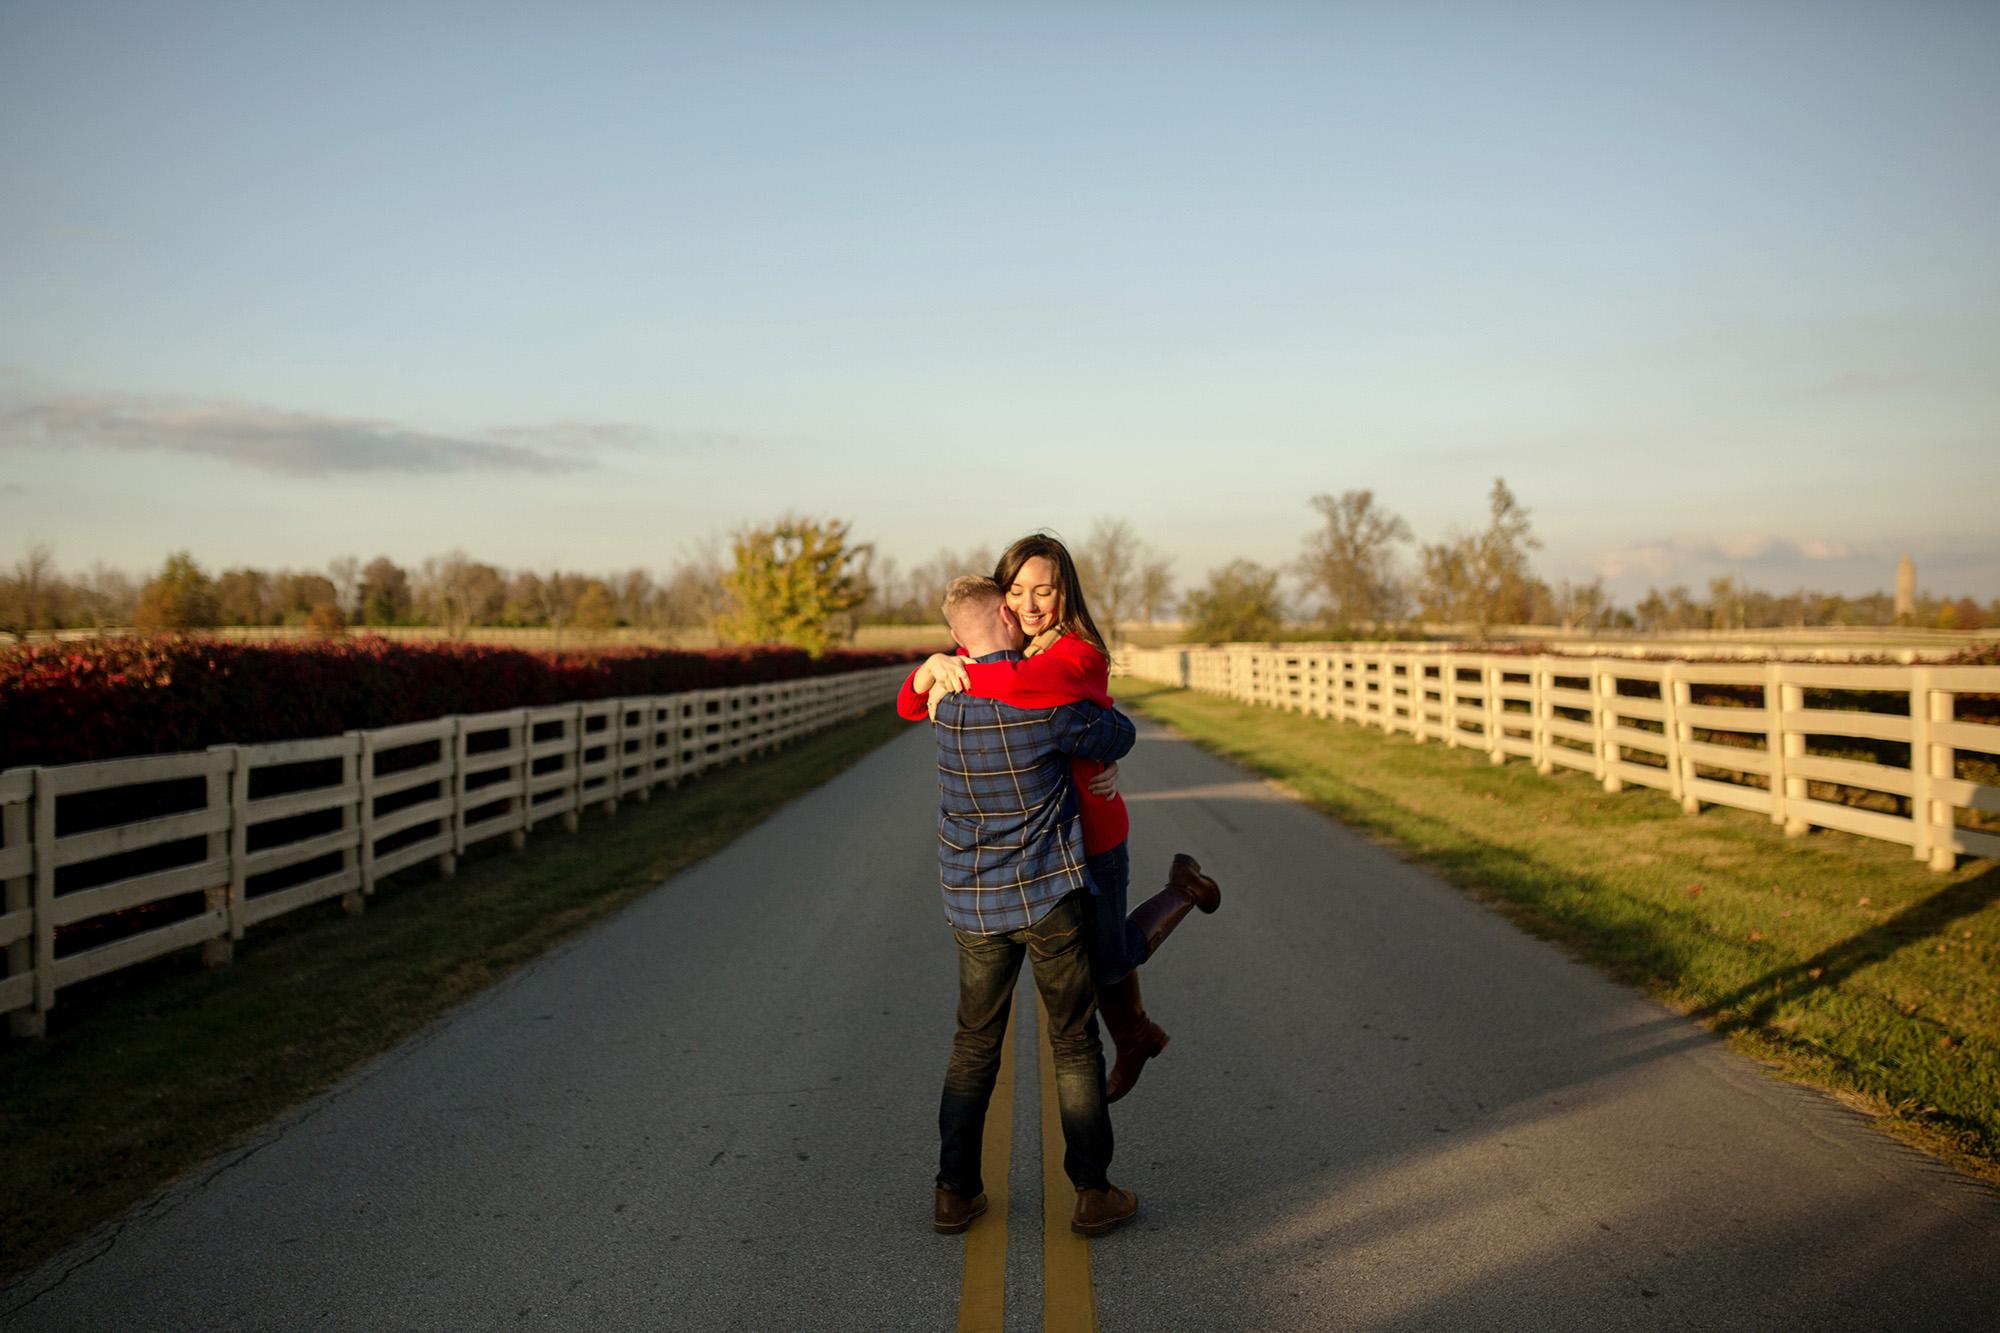 Seriously_Sabrina_Photography_Lexington_Kentucky_Backroads_Roadtrip_Engagement_RM072.jpg